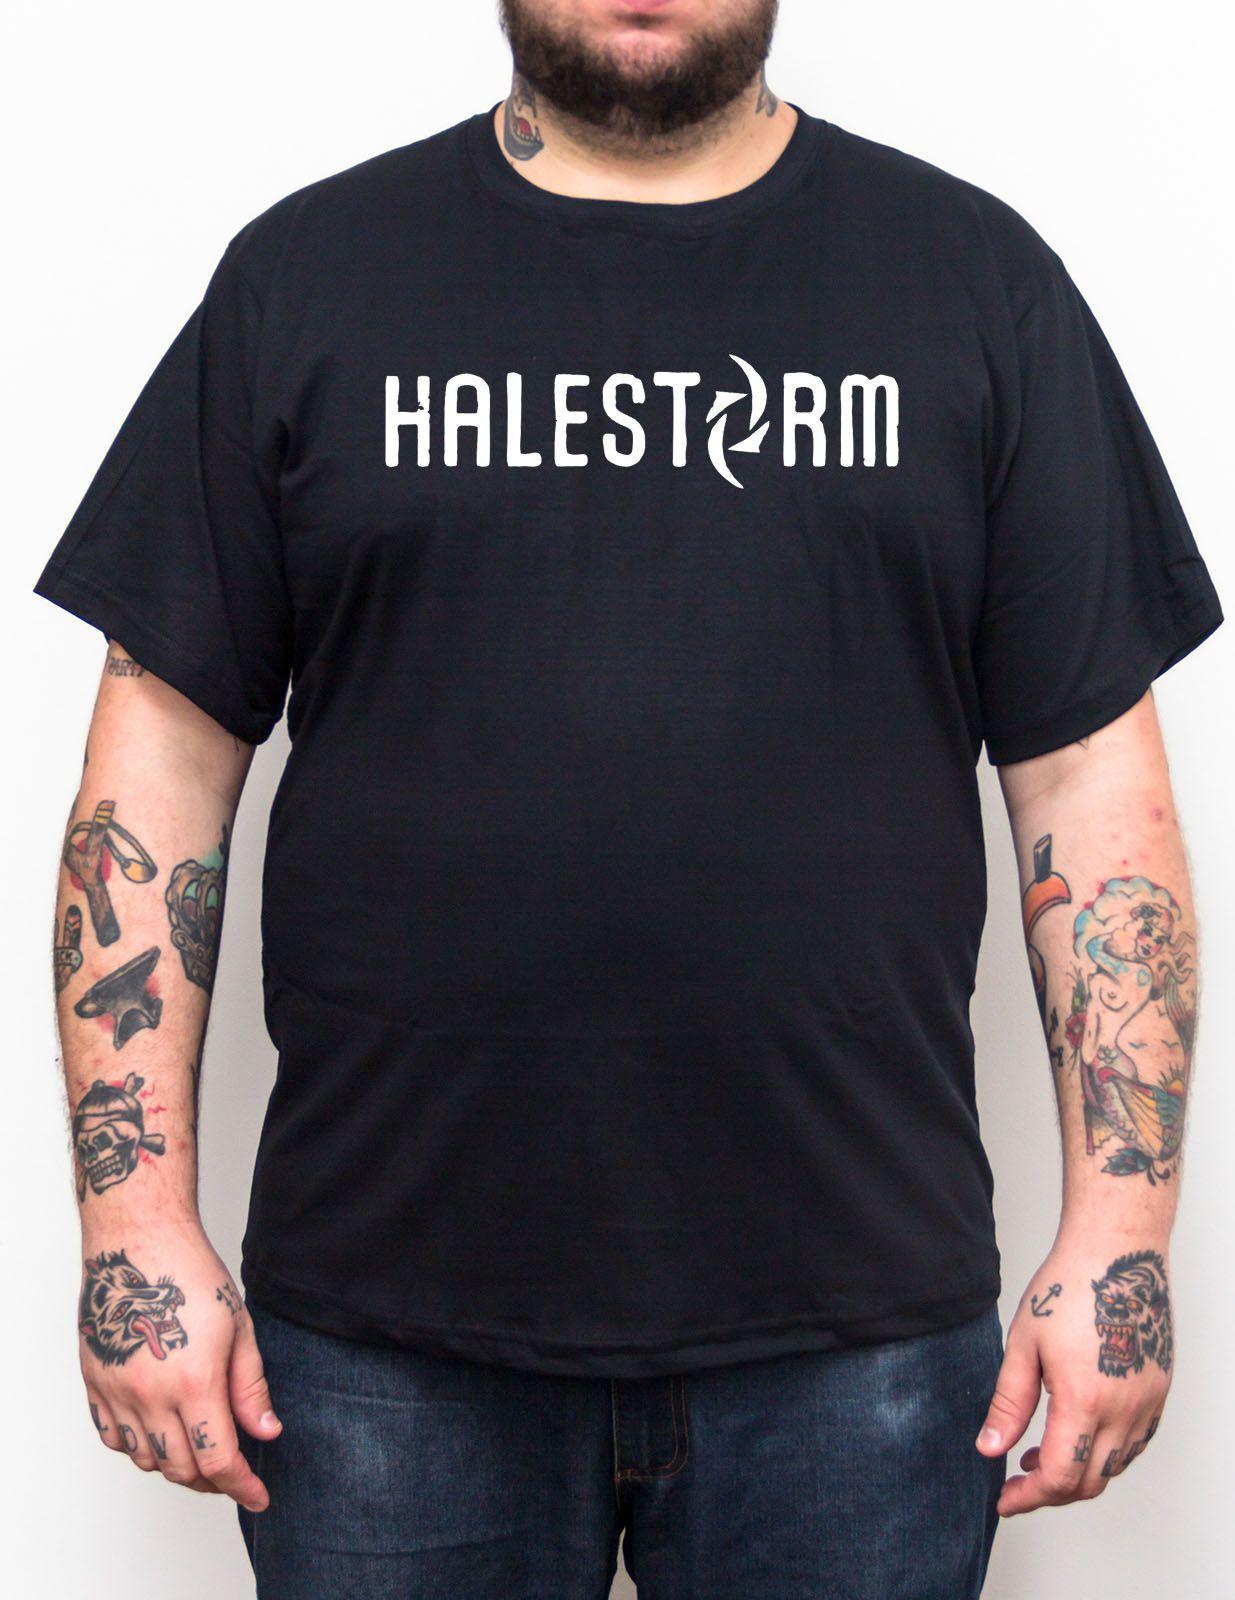 Camiseta Halestorm - Preto - Plus Size - Tamanho Grande Xg  - HShop